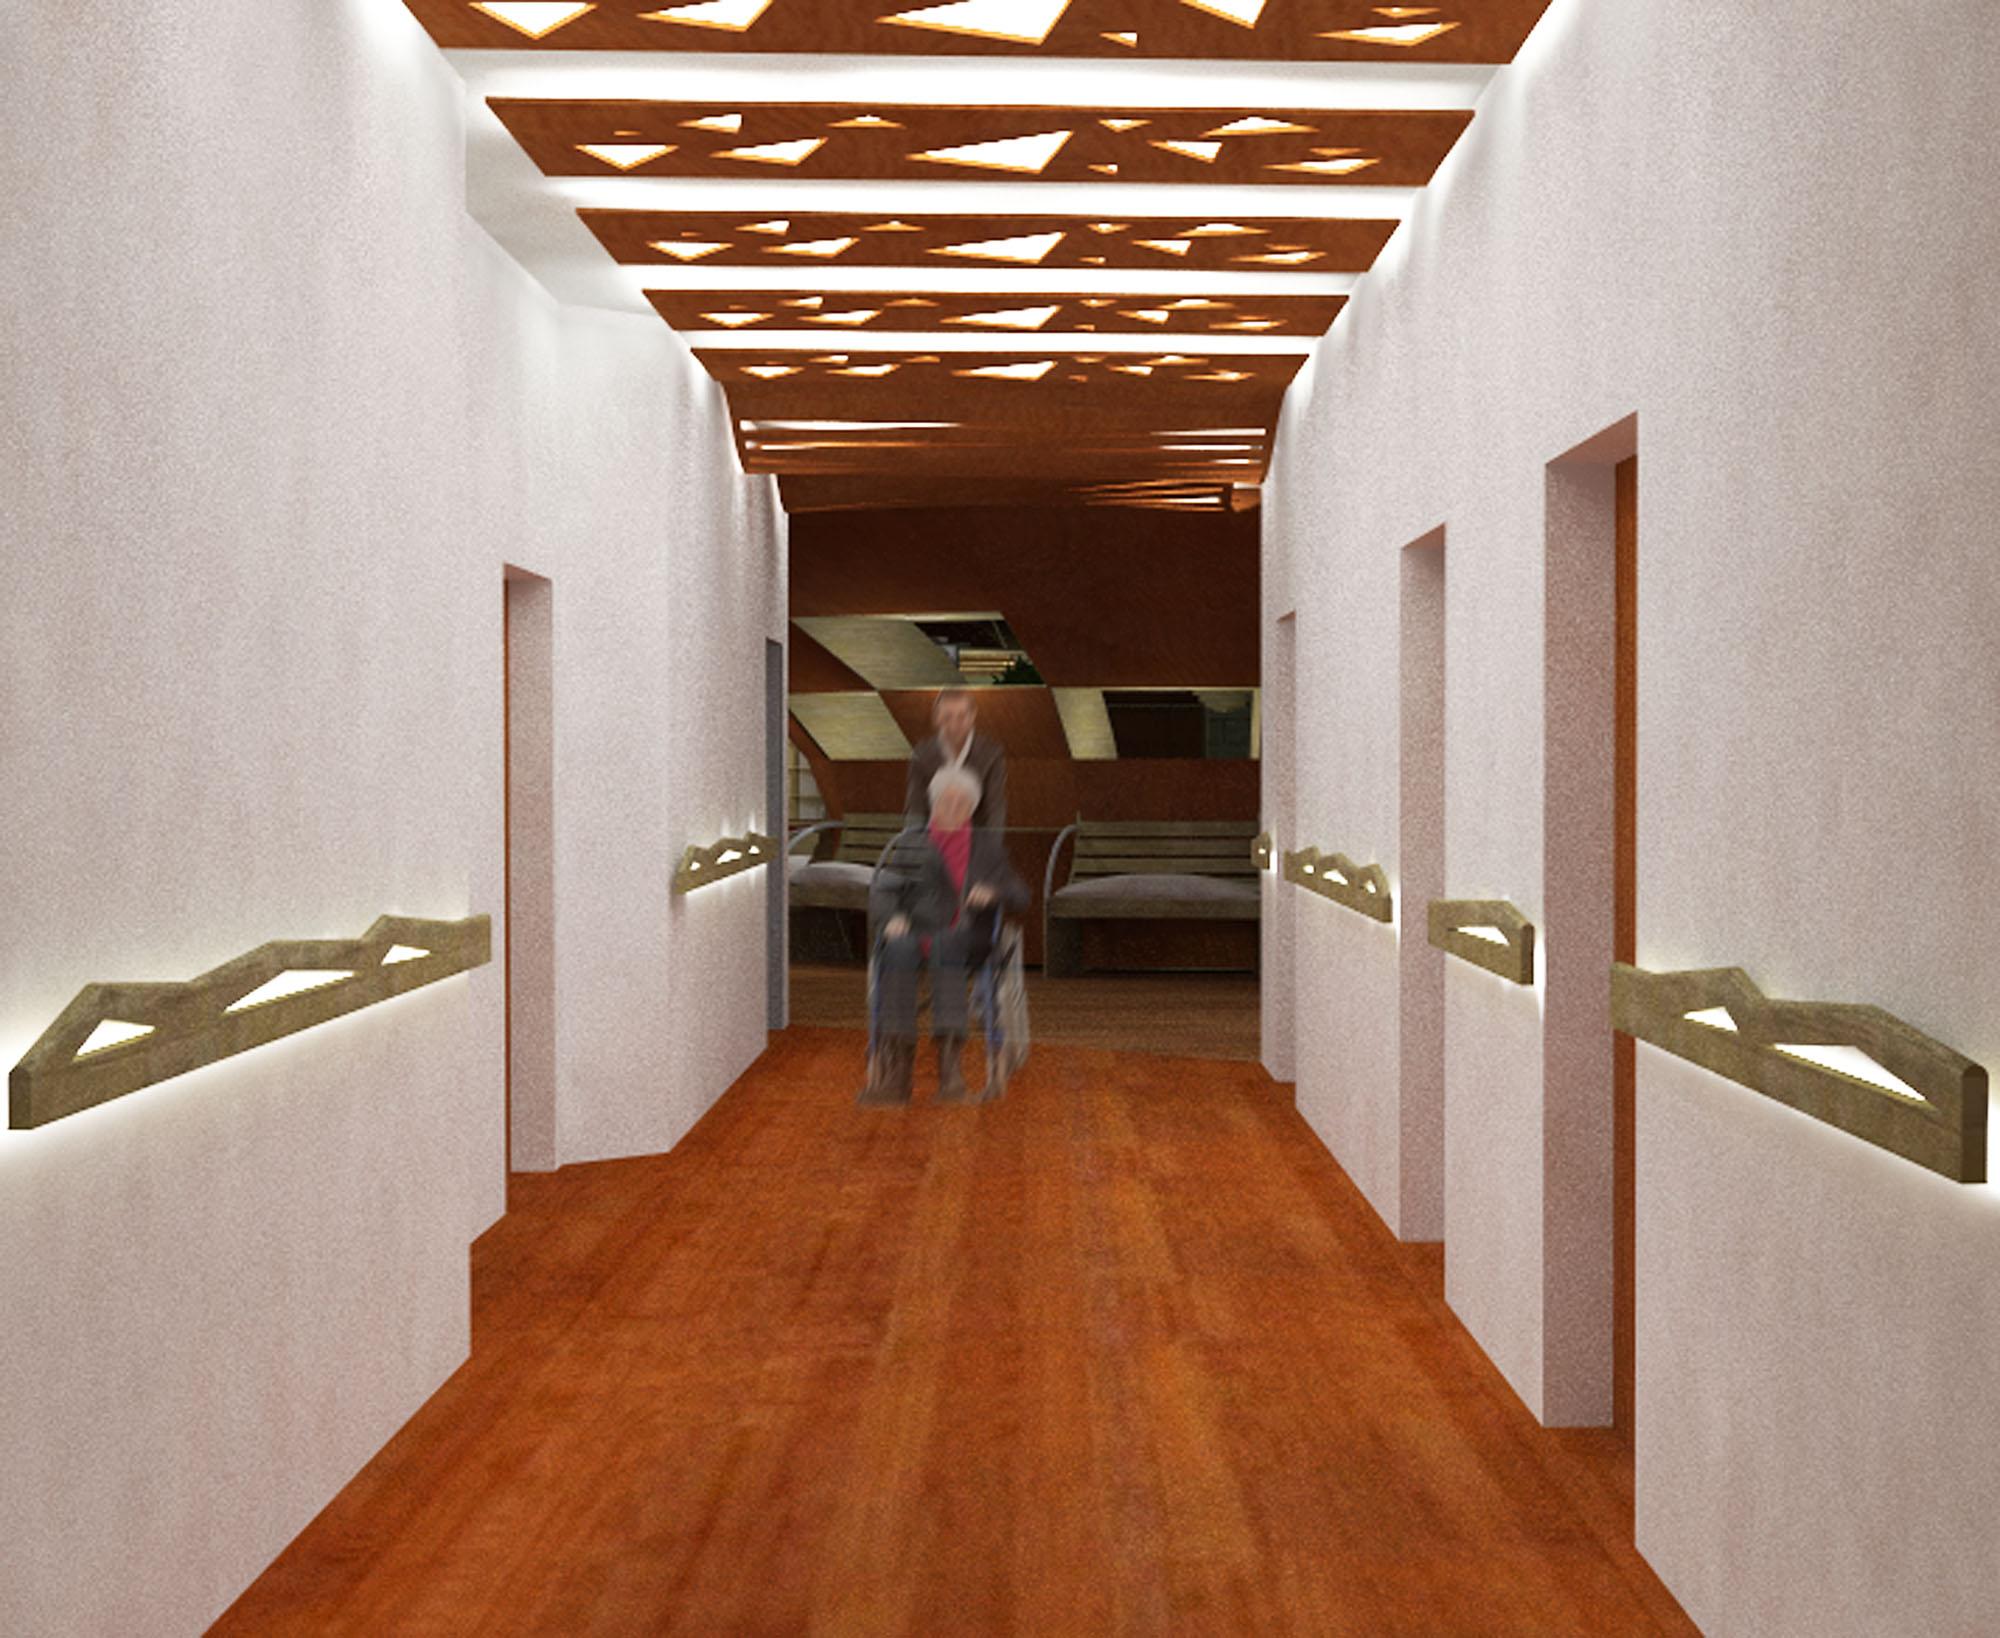 Wall-To-Ceiling_Hallway.jpg